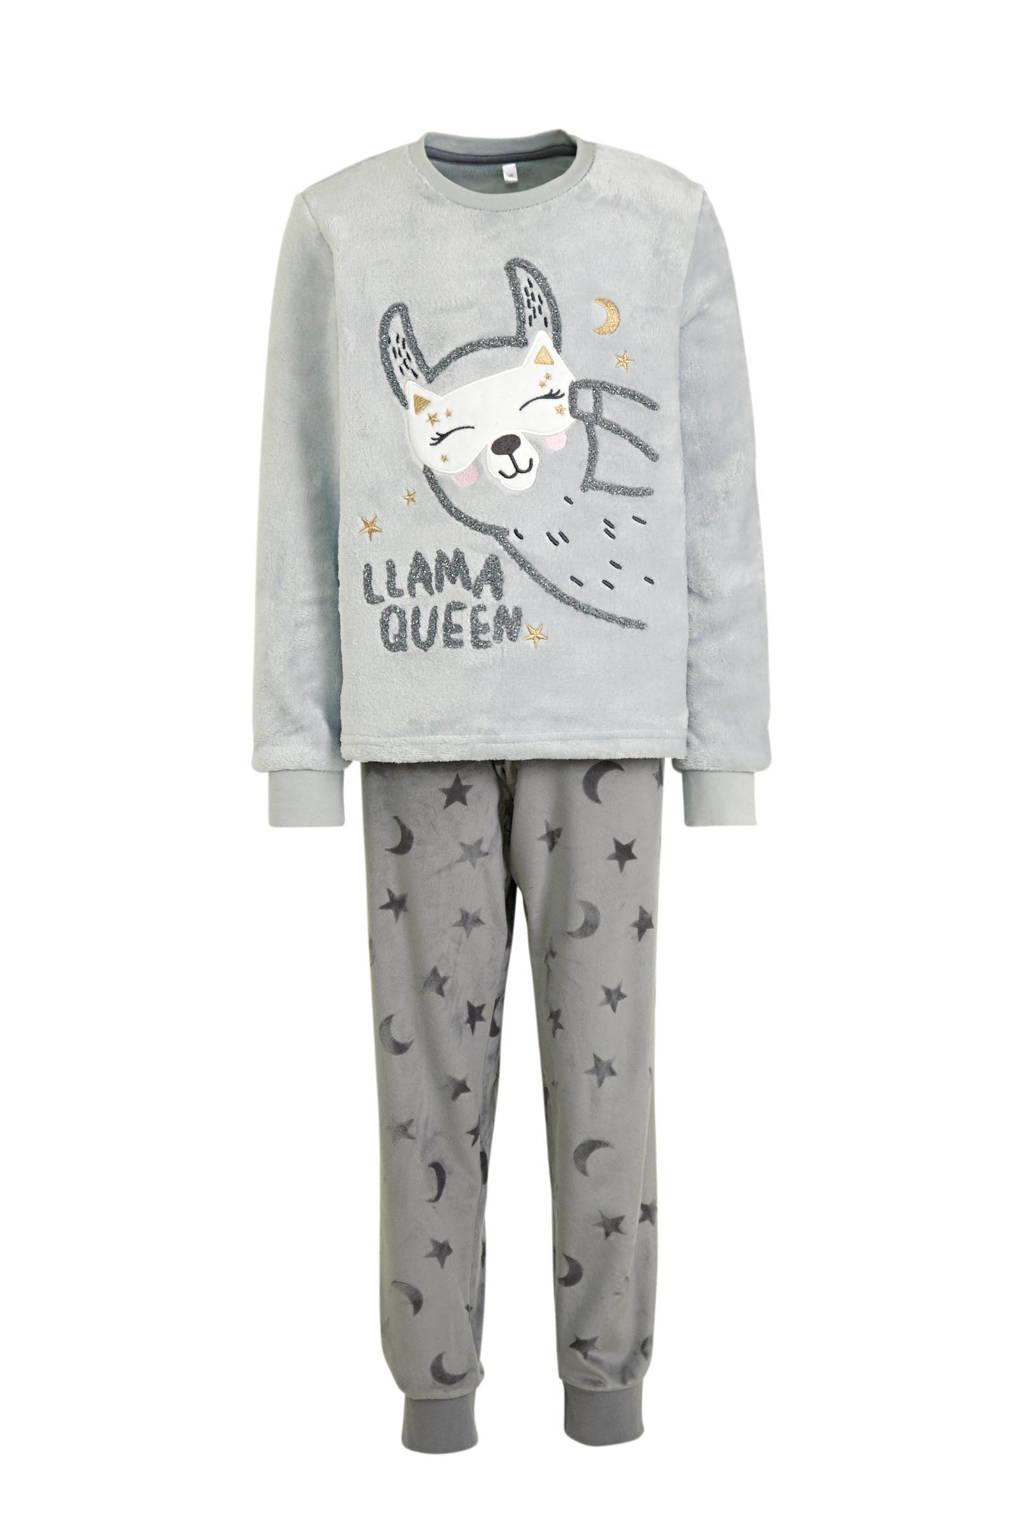 C&A Here & There pyjama grijs, Grijs